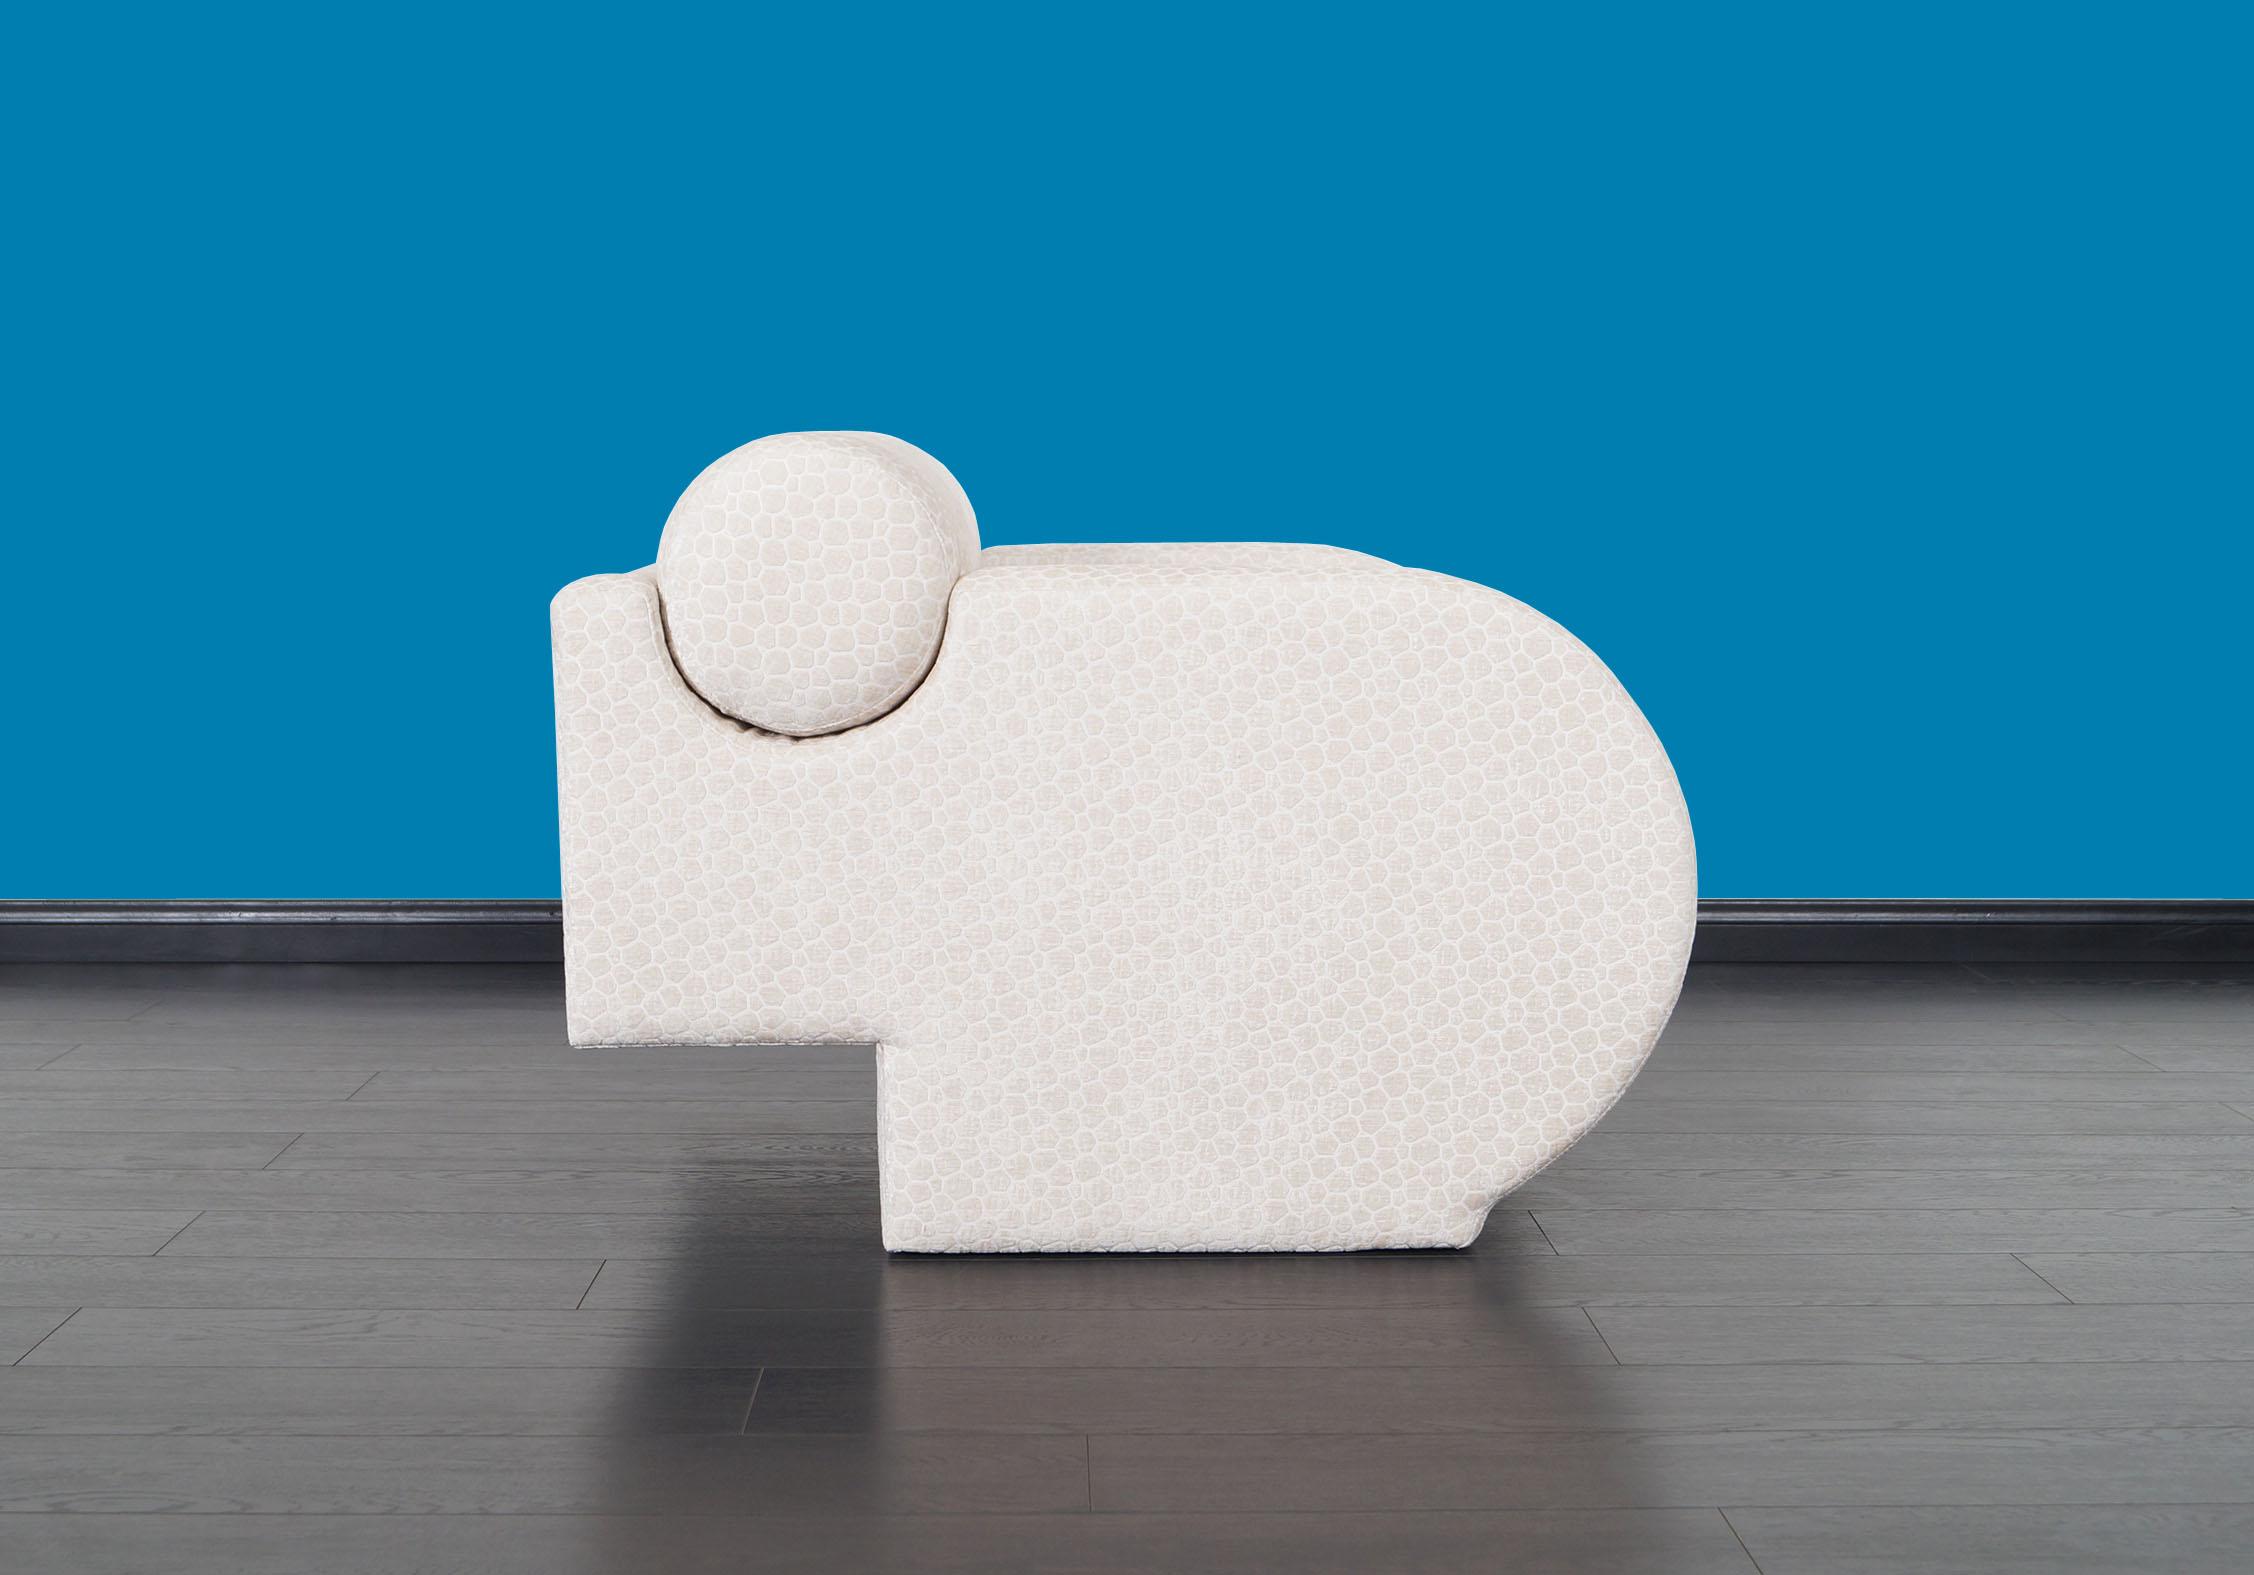 Directional Lounge Chairs by Vladimir Kagan